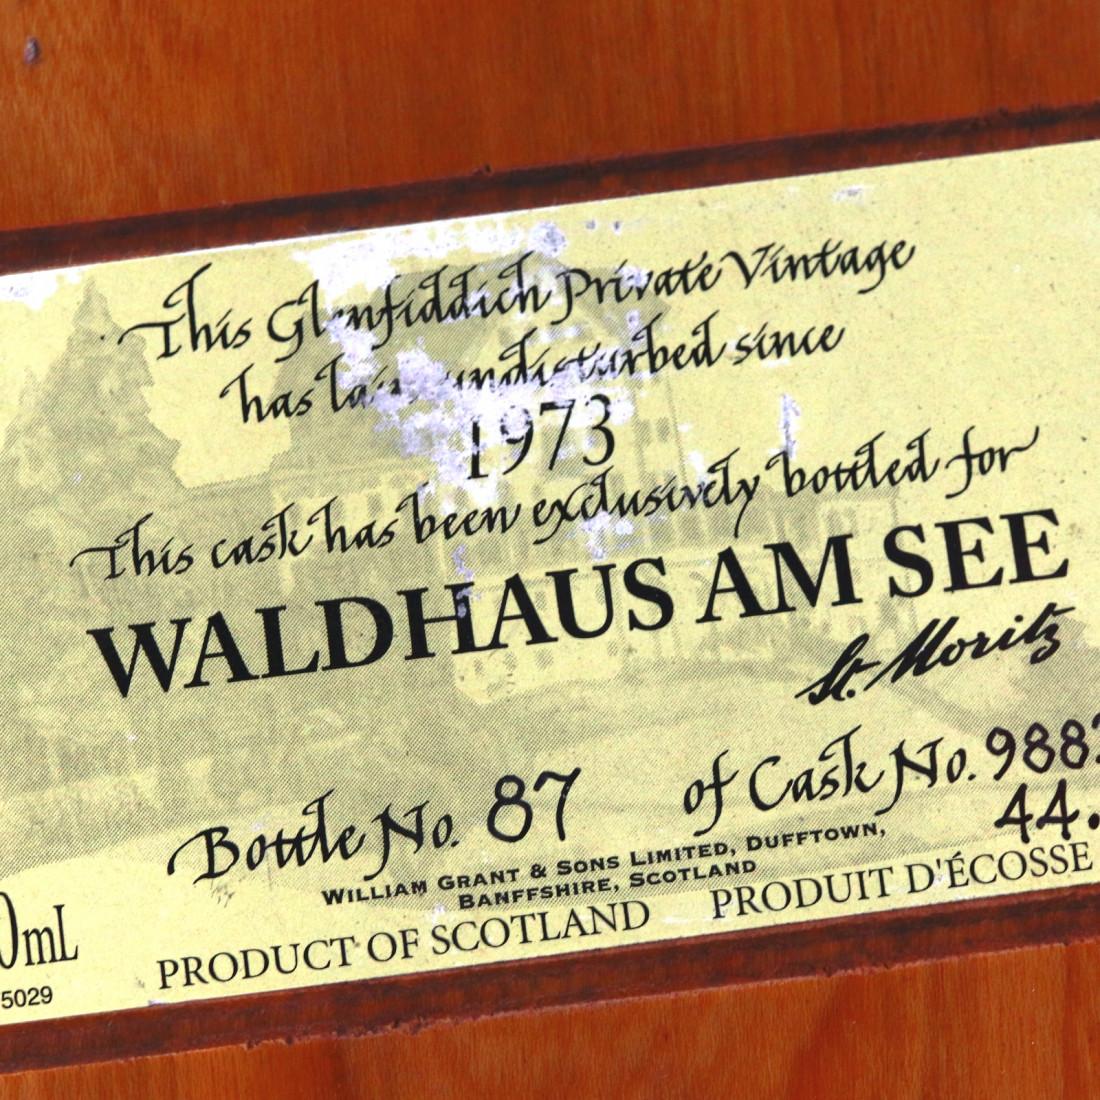 Glenfiddich 1973 Private Vintage #9883 / Waldhaus Am See